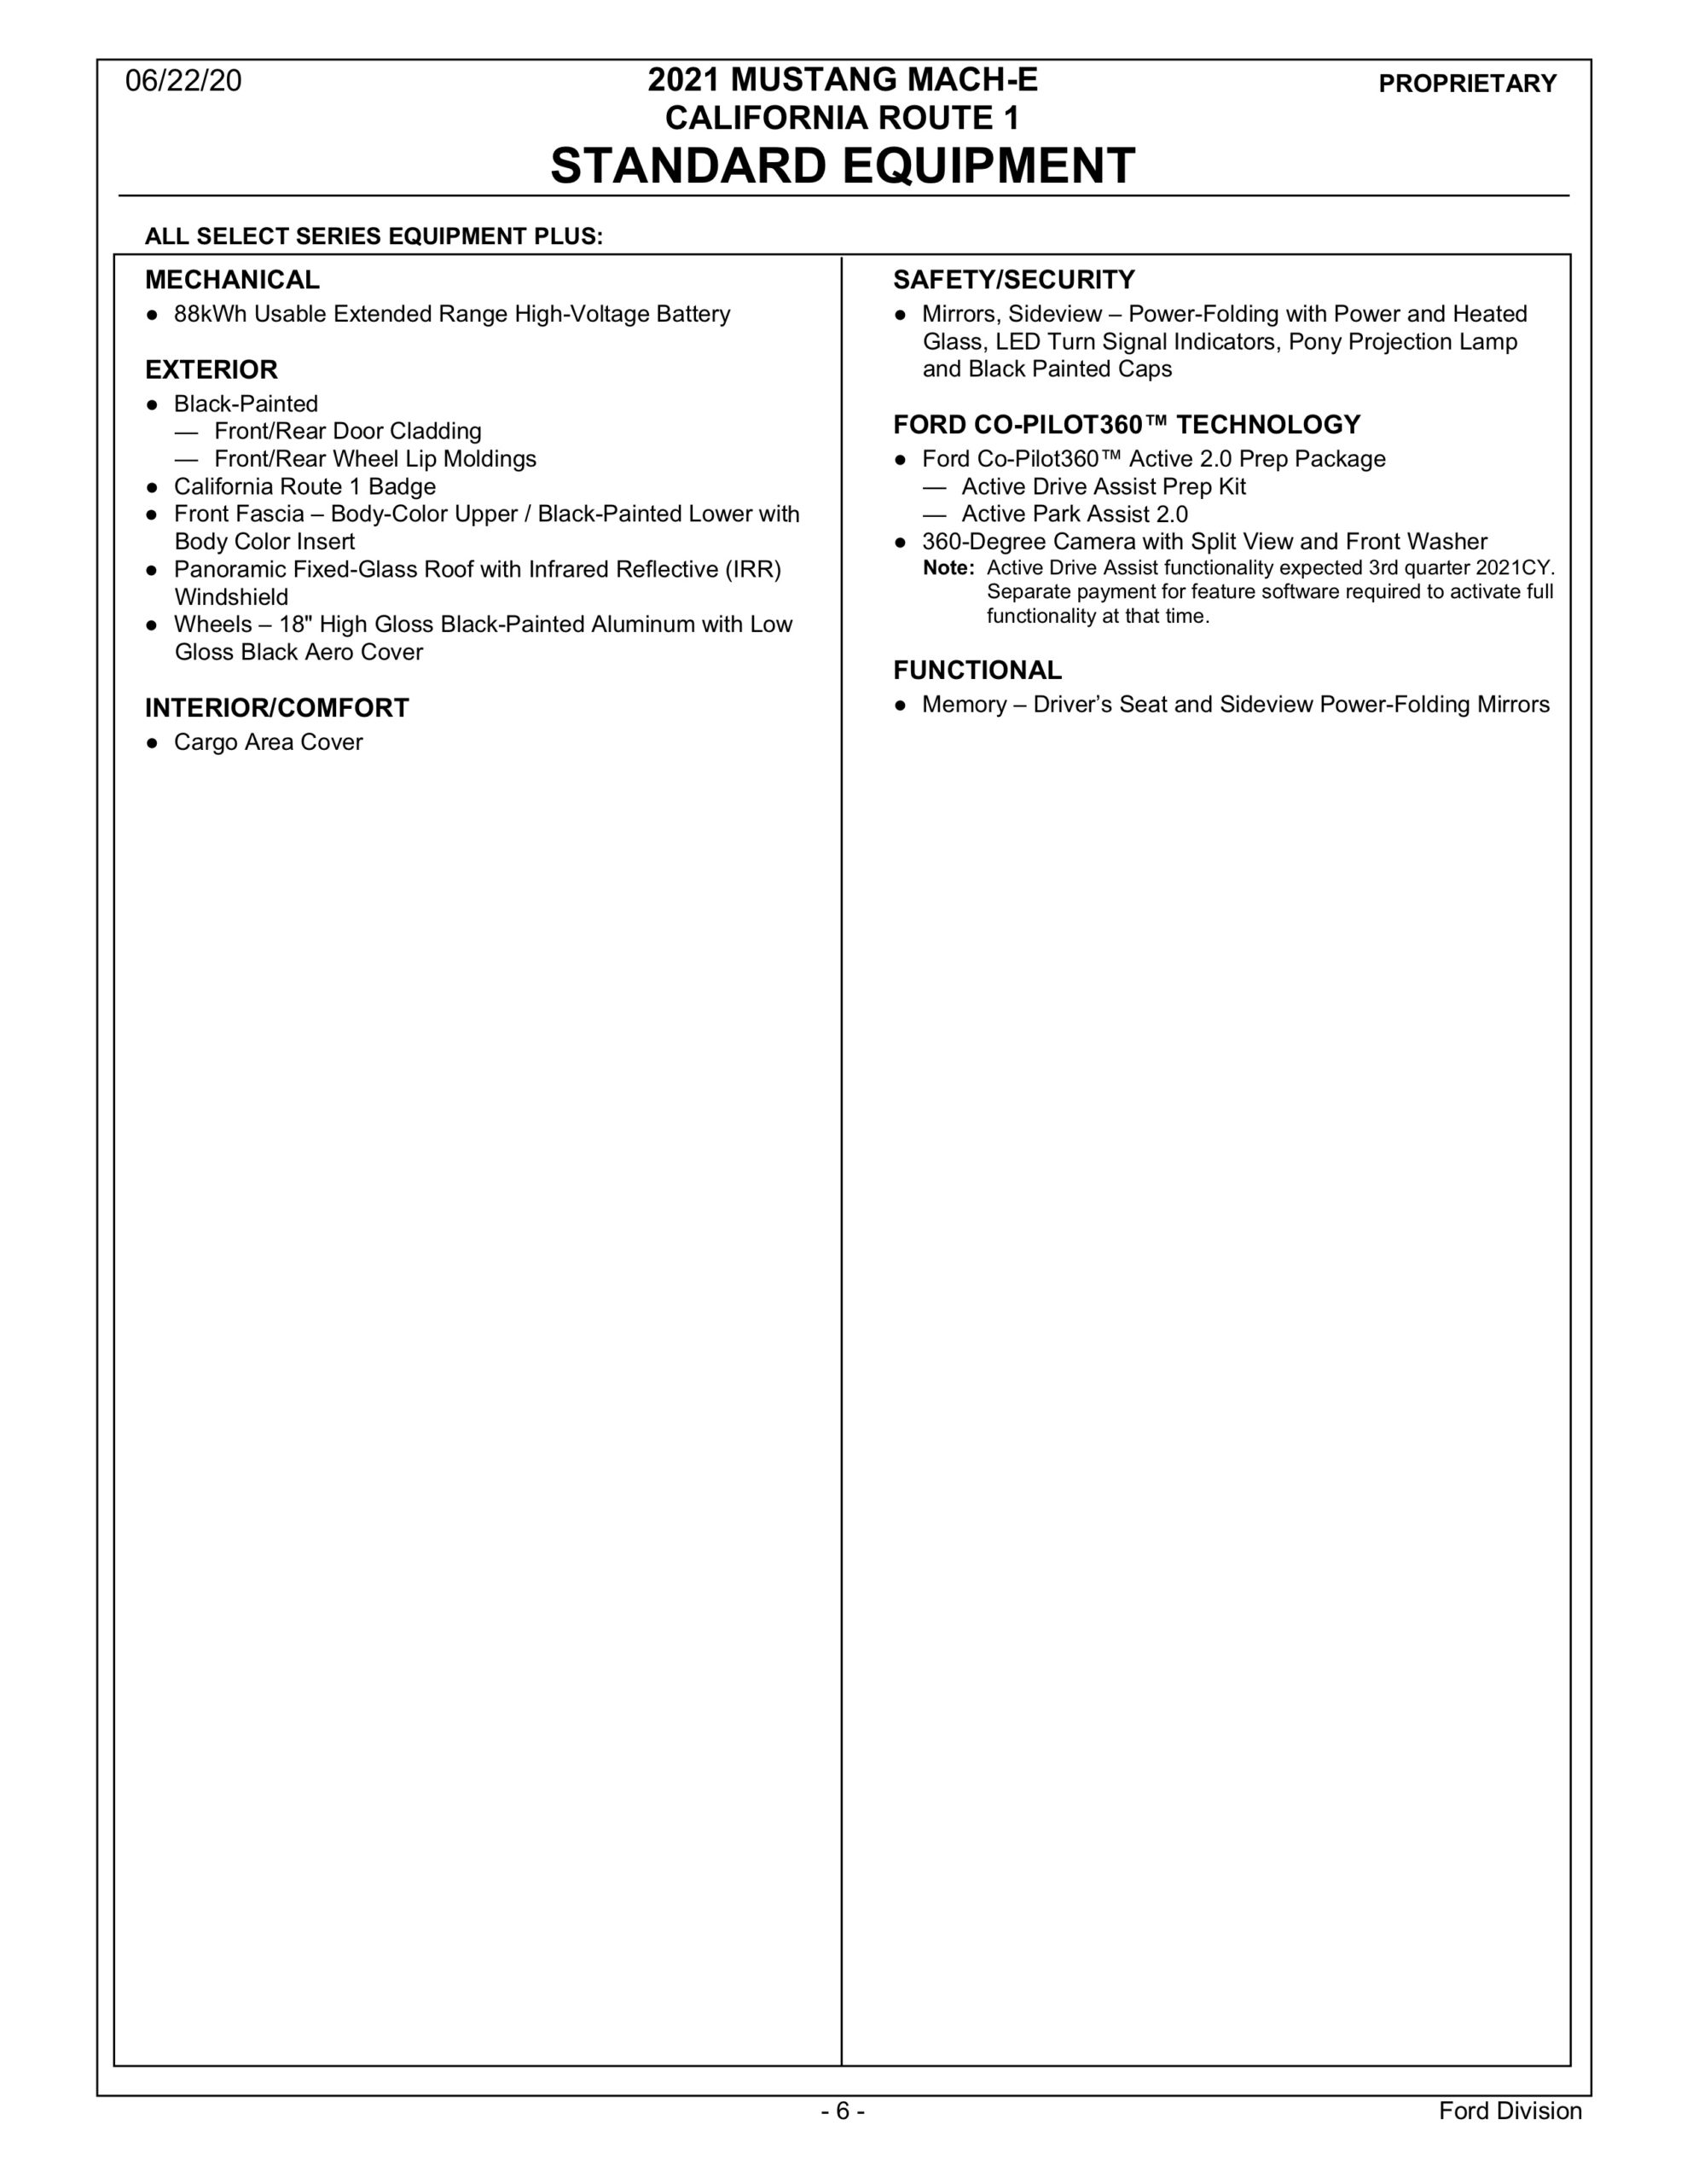 2021 Mach E Order Guide